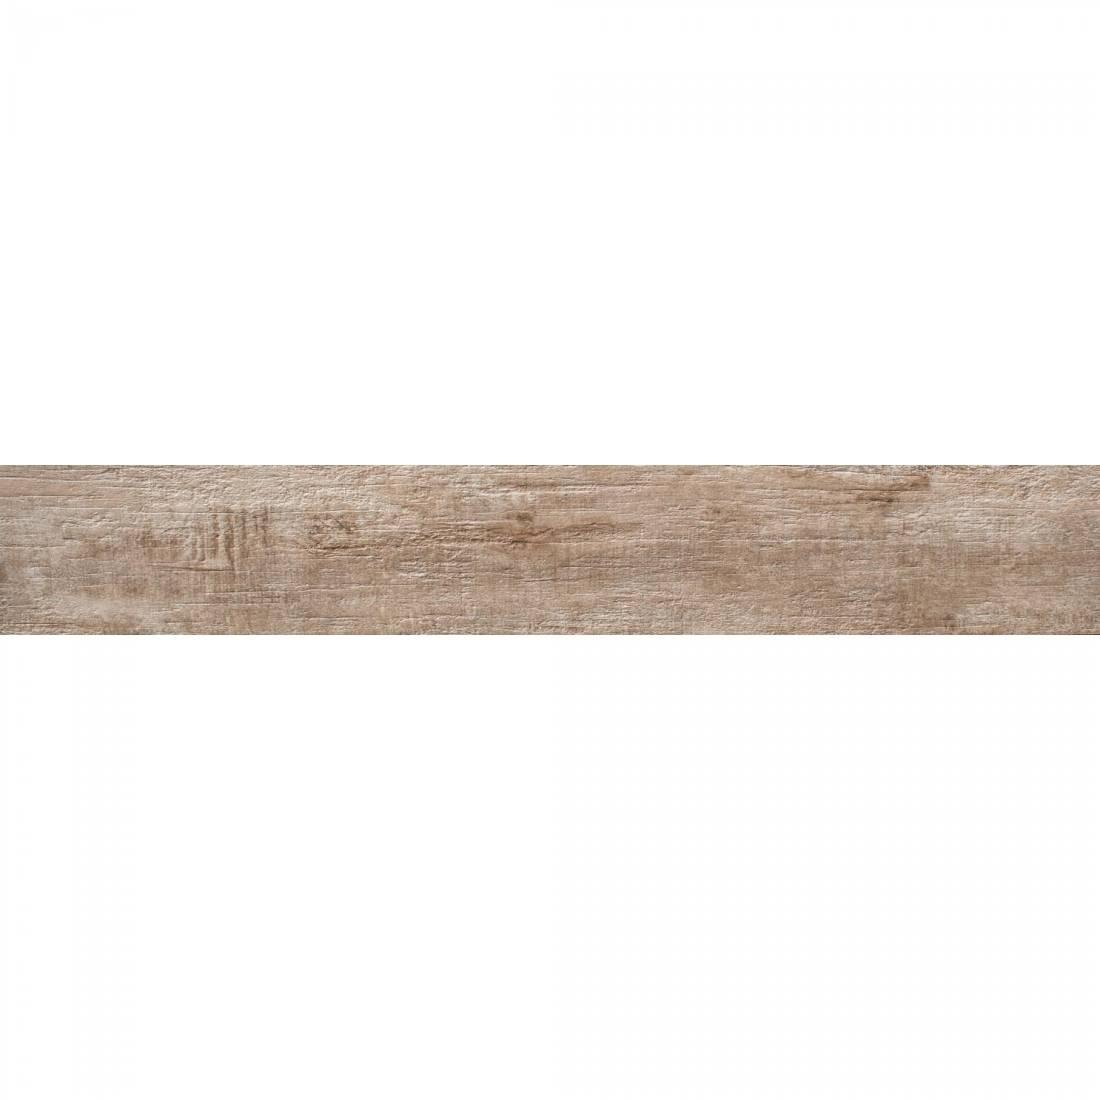 Home Wood 15x90 Carlow Beige Matt 1